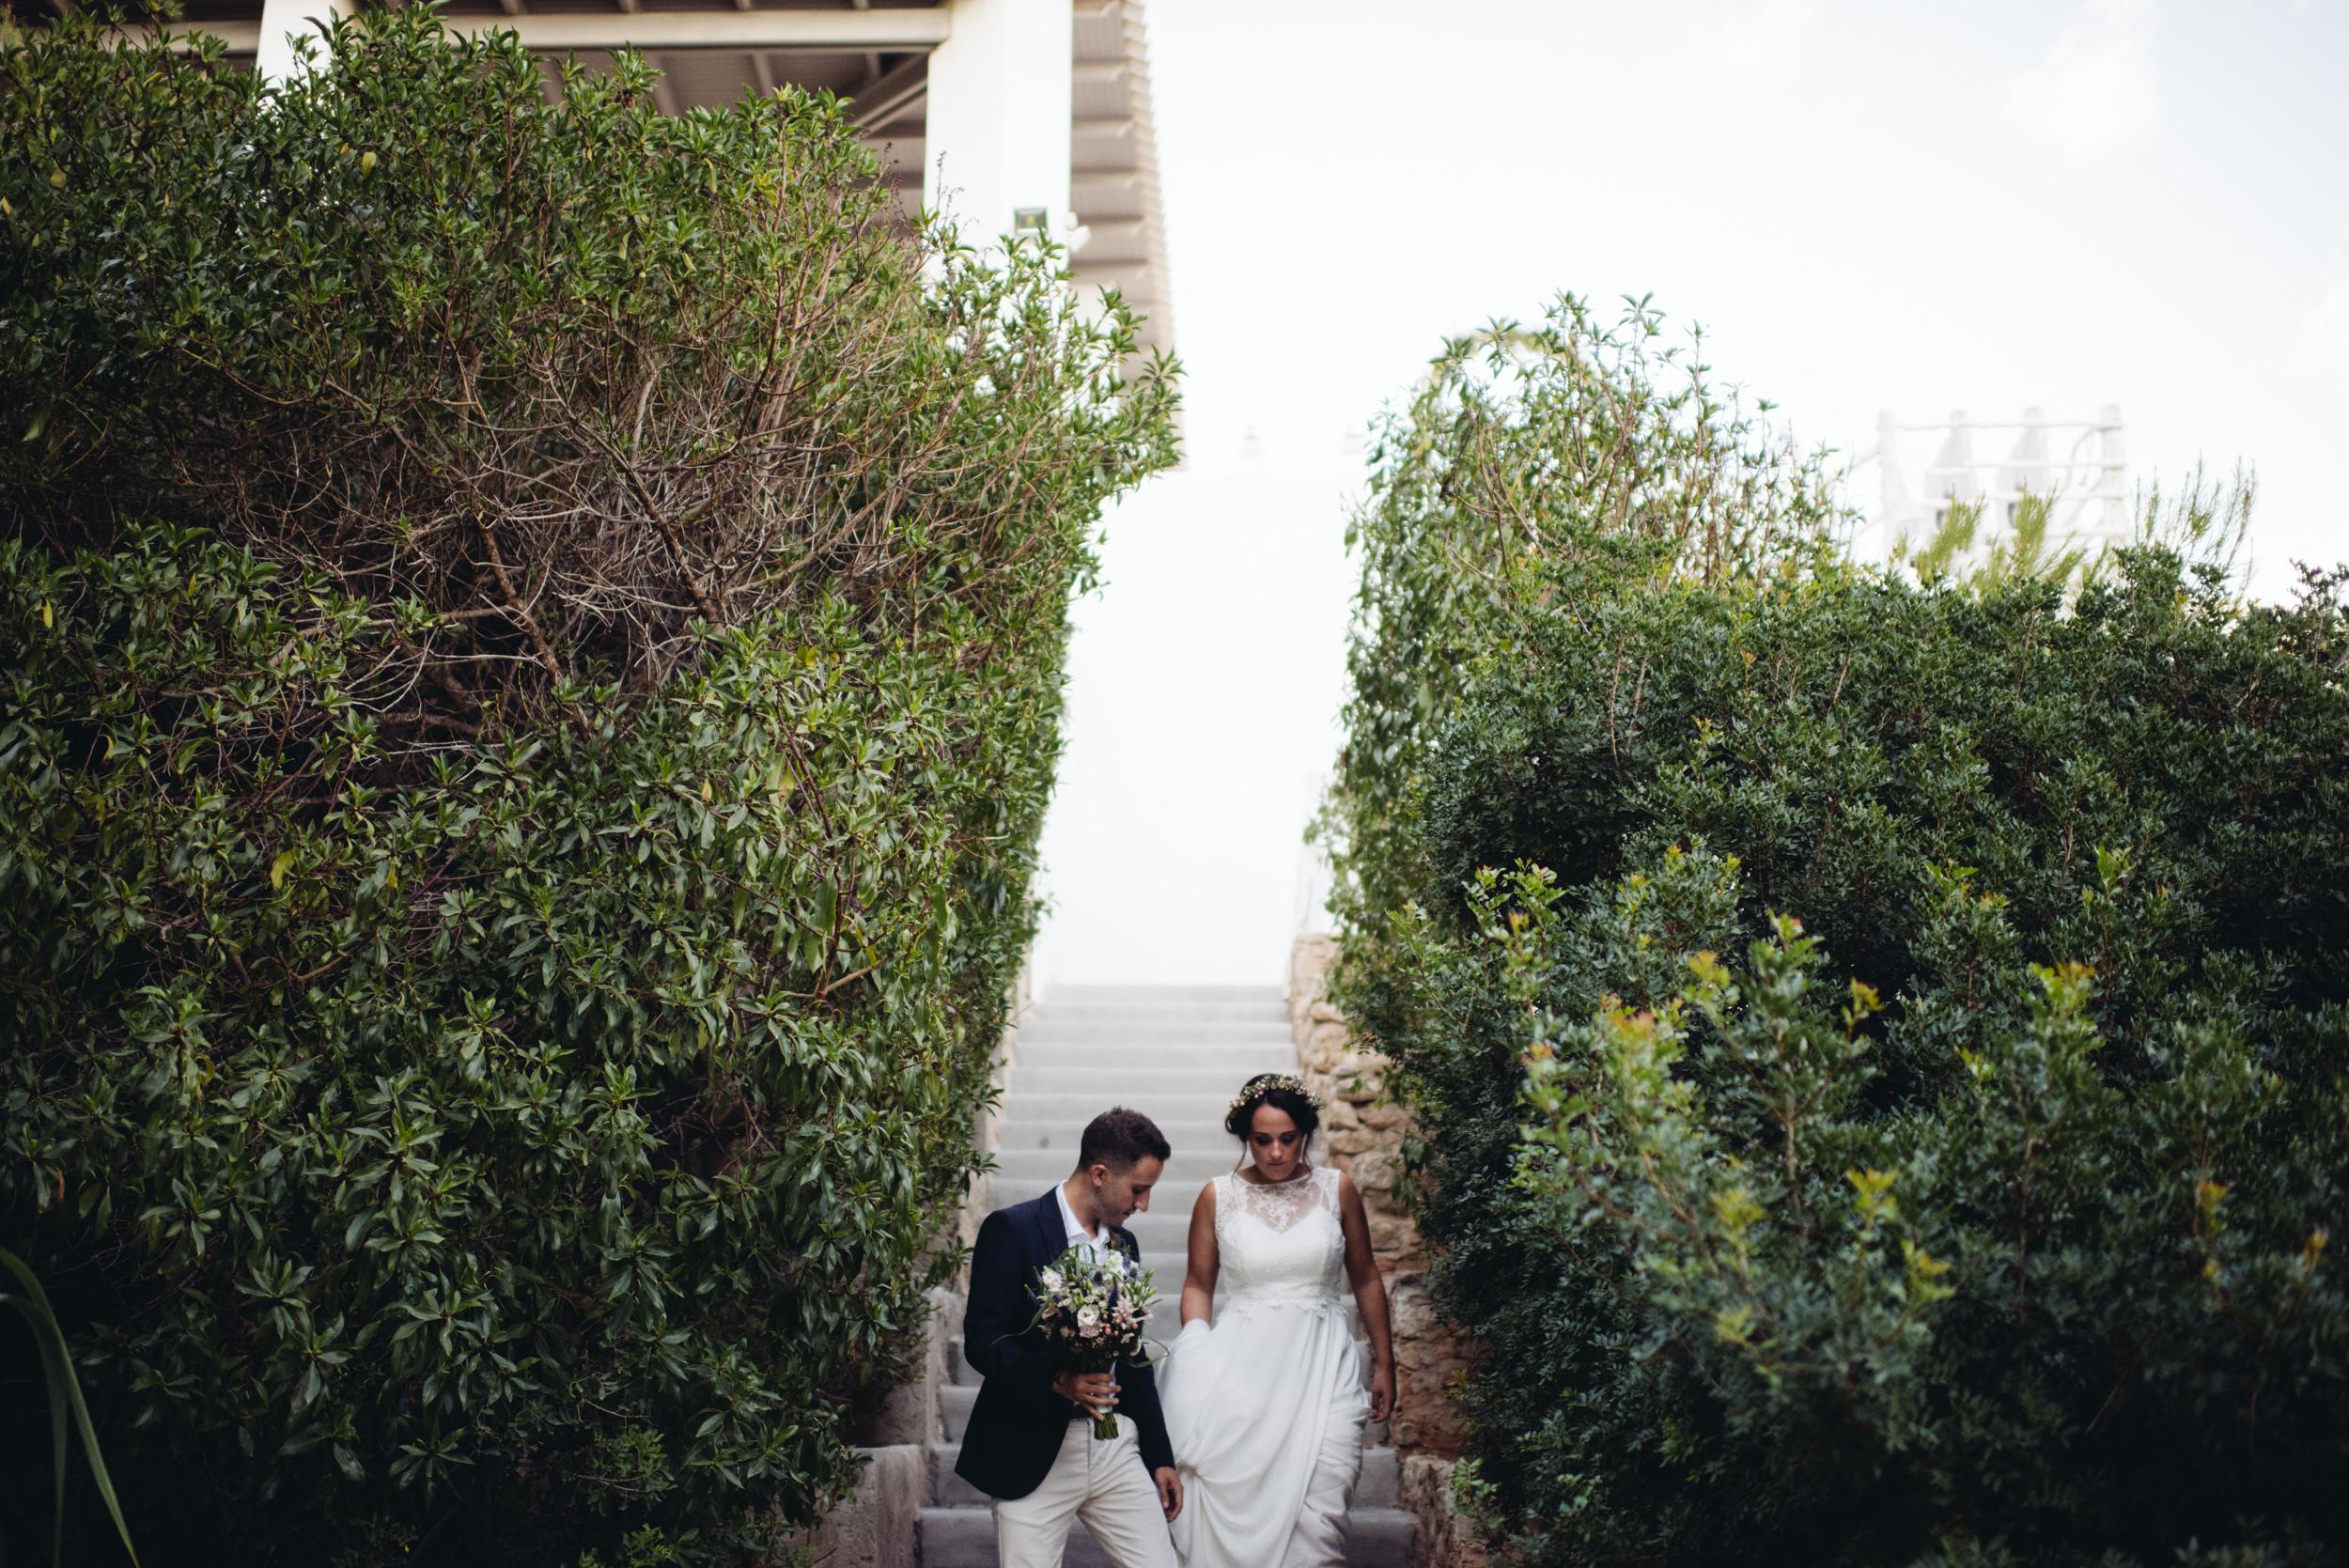 0129-alternative-wedding-portrait-family-kids-photographer-glasgow-scotland.JPG